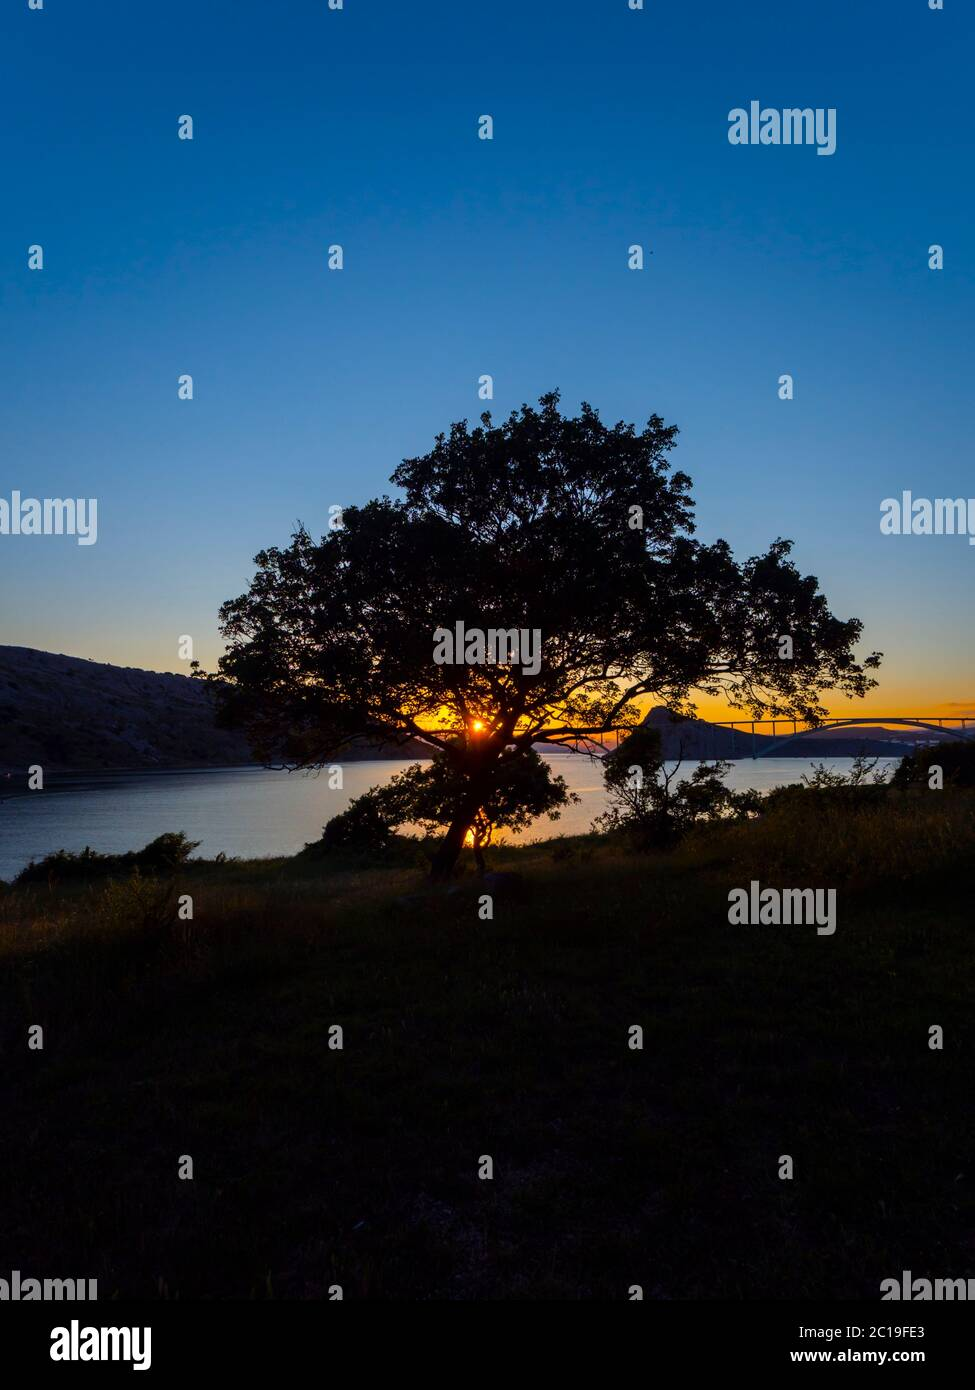 Sonnenuntergang Landschaft Brücke Festland zur Insel Krk Kroatien Blick durch dominanten Baum Stockfoto